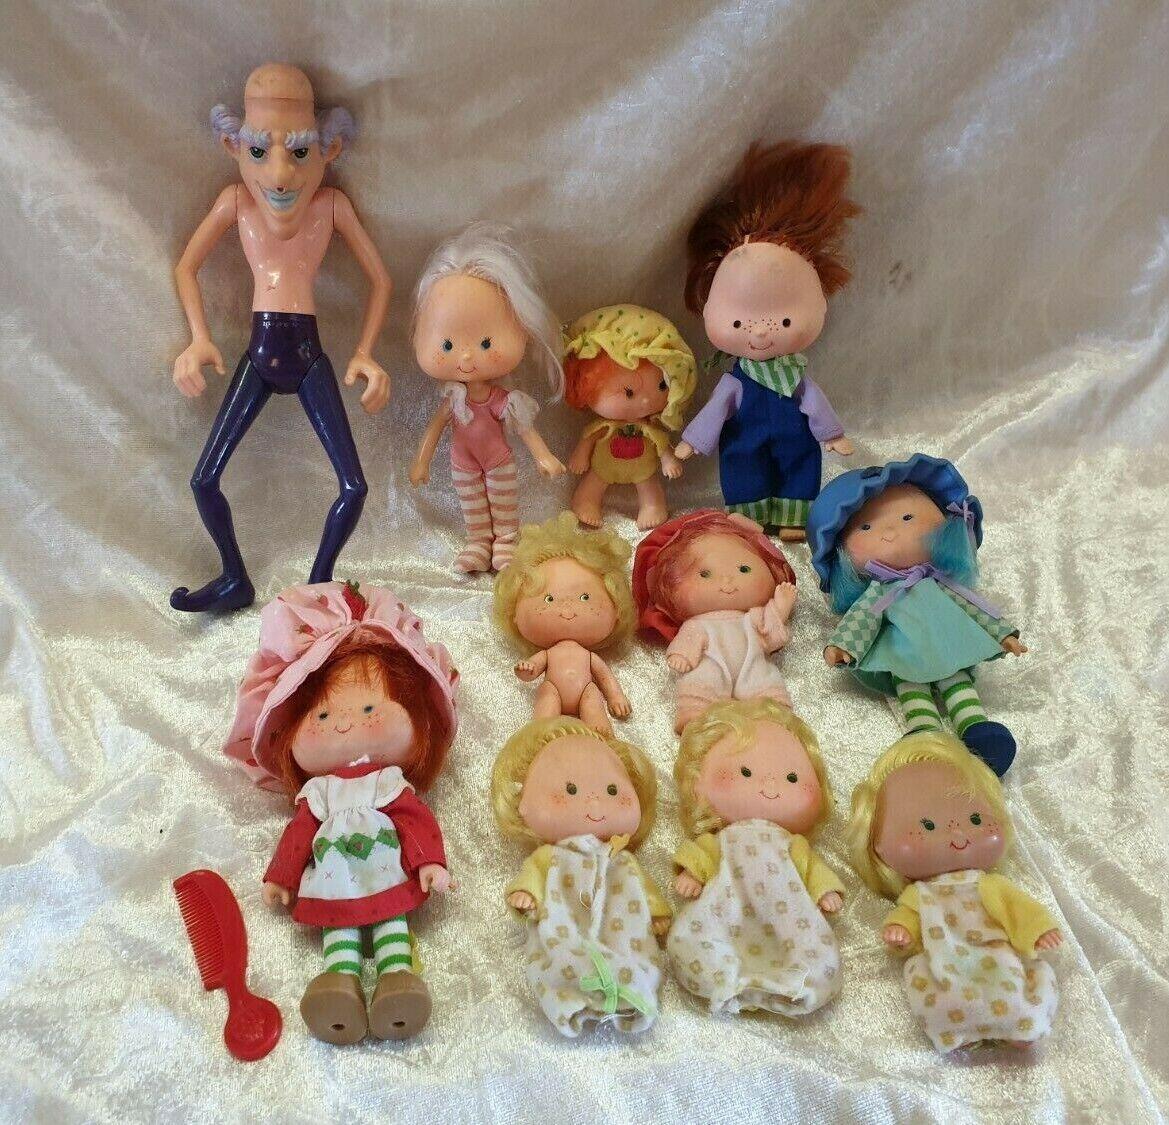 Vintage lot of 11 Strawberry Shortcake figurines dolls doll 1980s